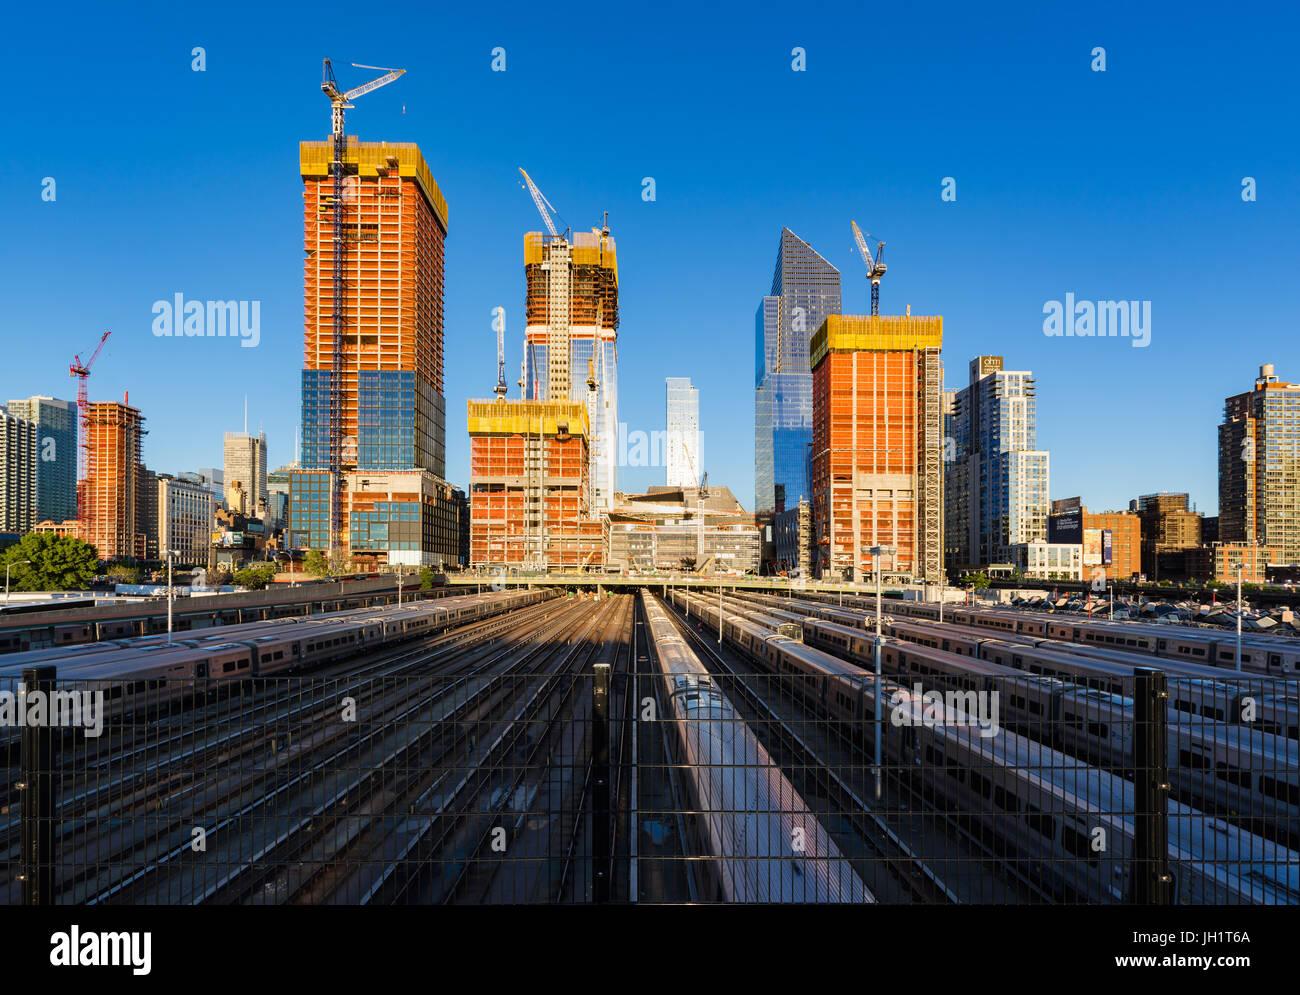 Die Hudson Yards Baustelle mit Bahn verfolgt (2017). Midtown Manhattan, New York City Stockbild